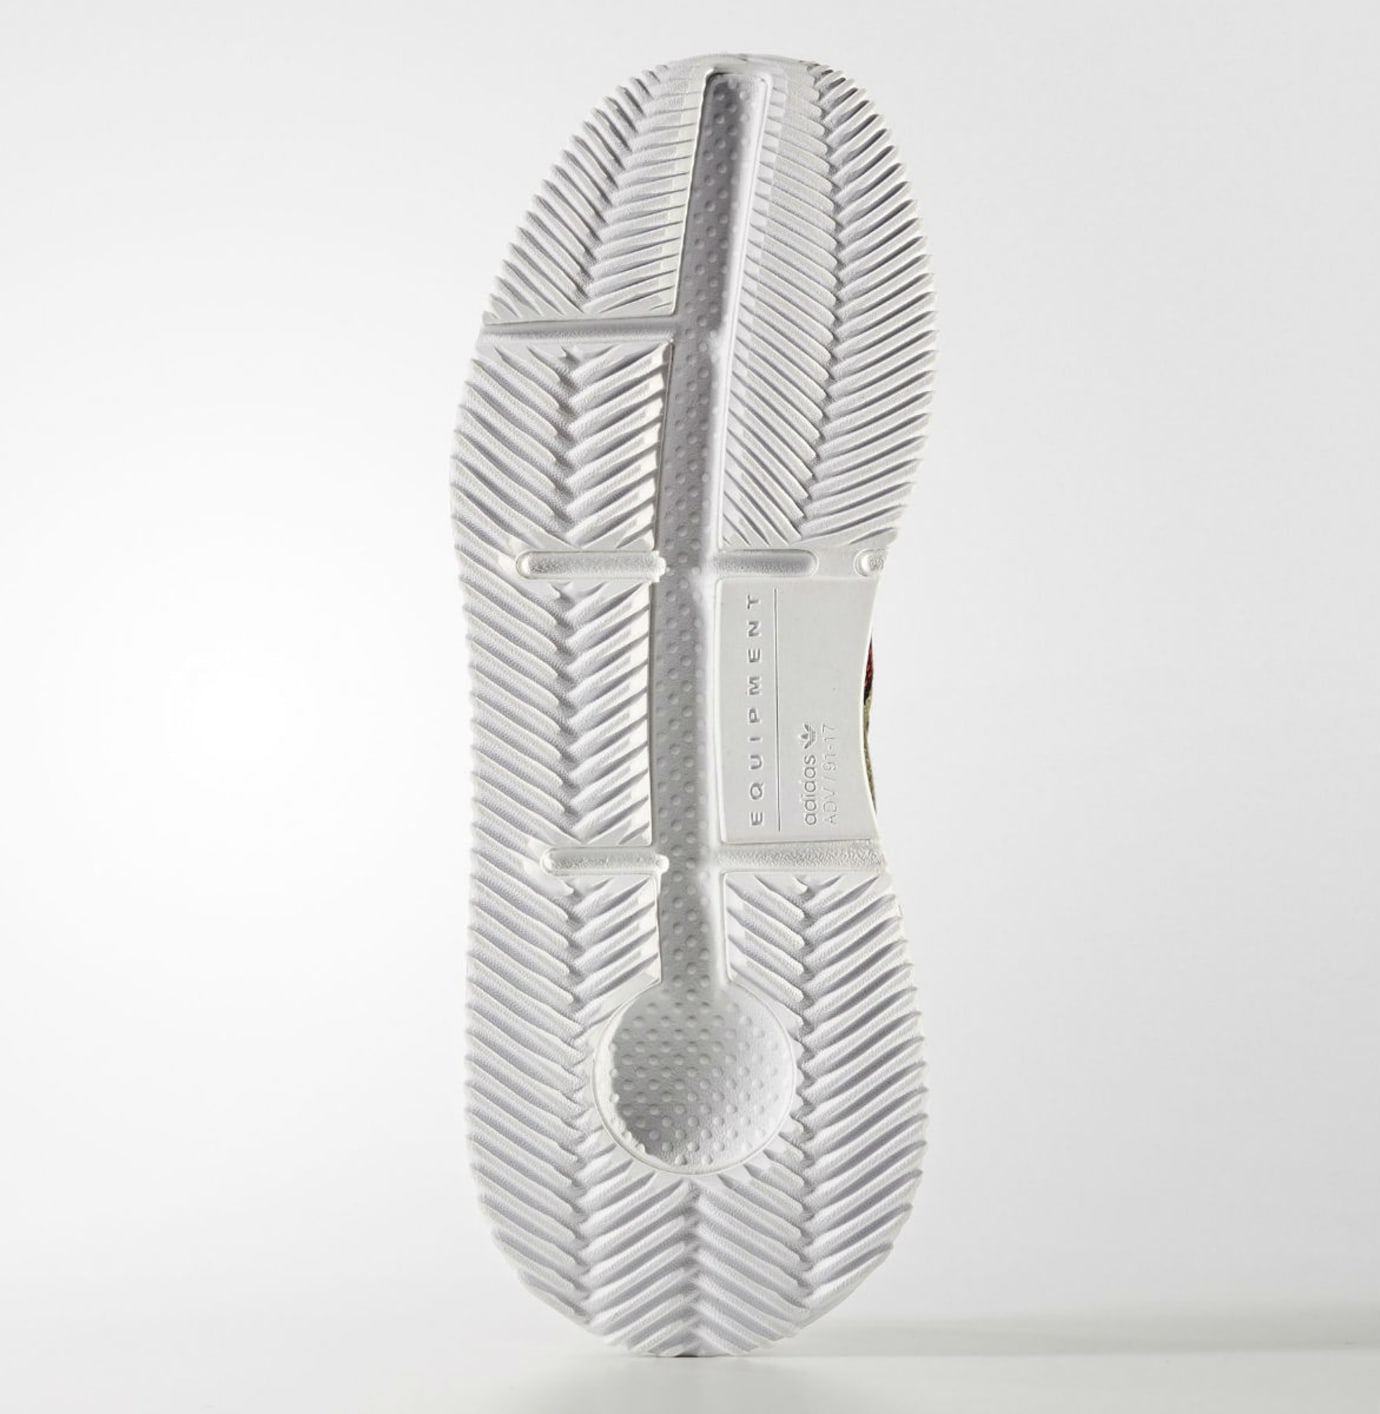 pick up 8d98a d15b3 Adidas EQT Cushion ADV Olive Camo Release Date AC7722 Sole